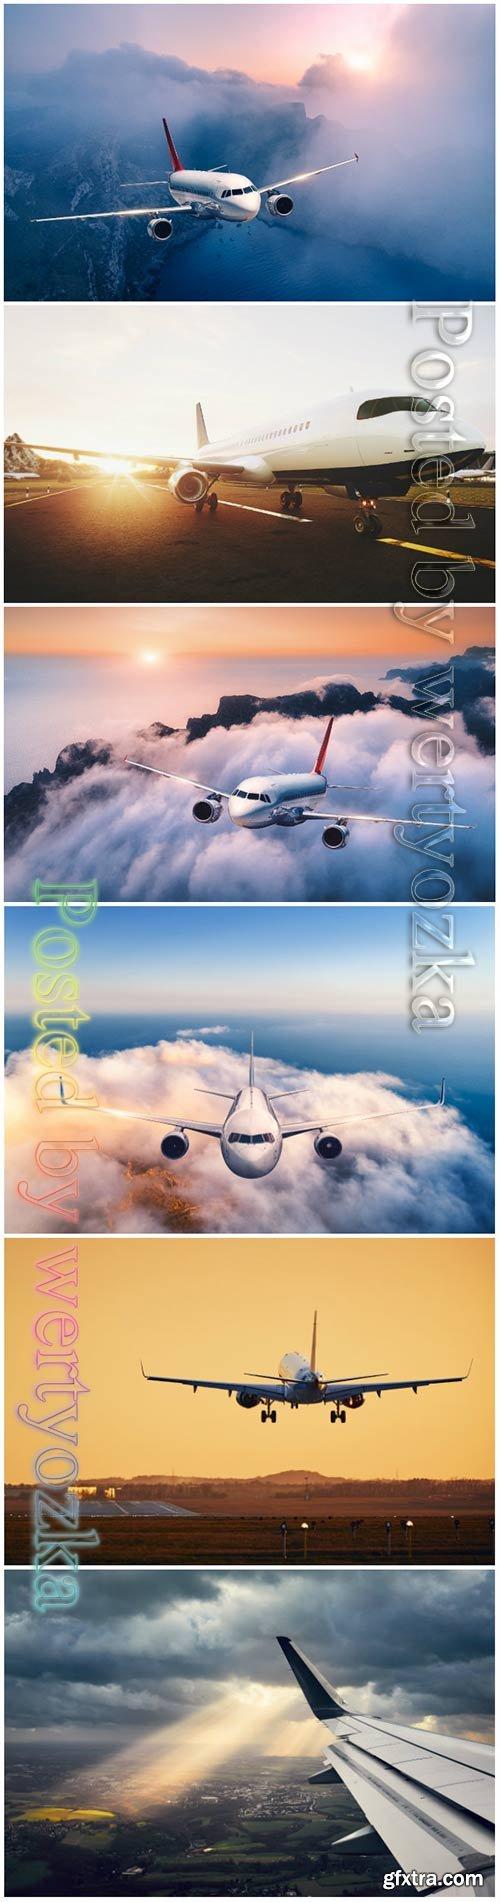 Airplane beautiful stock photo